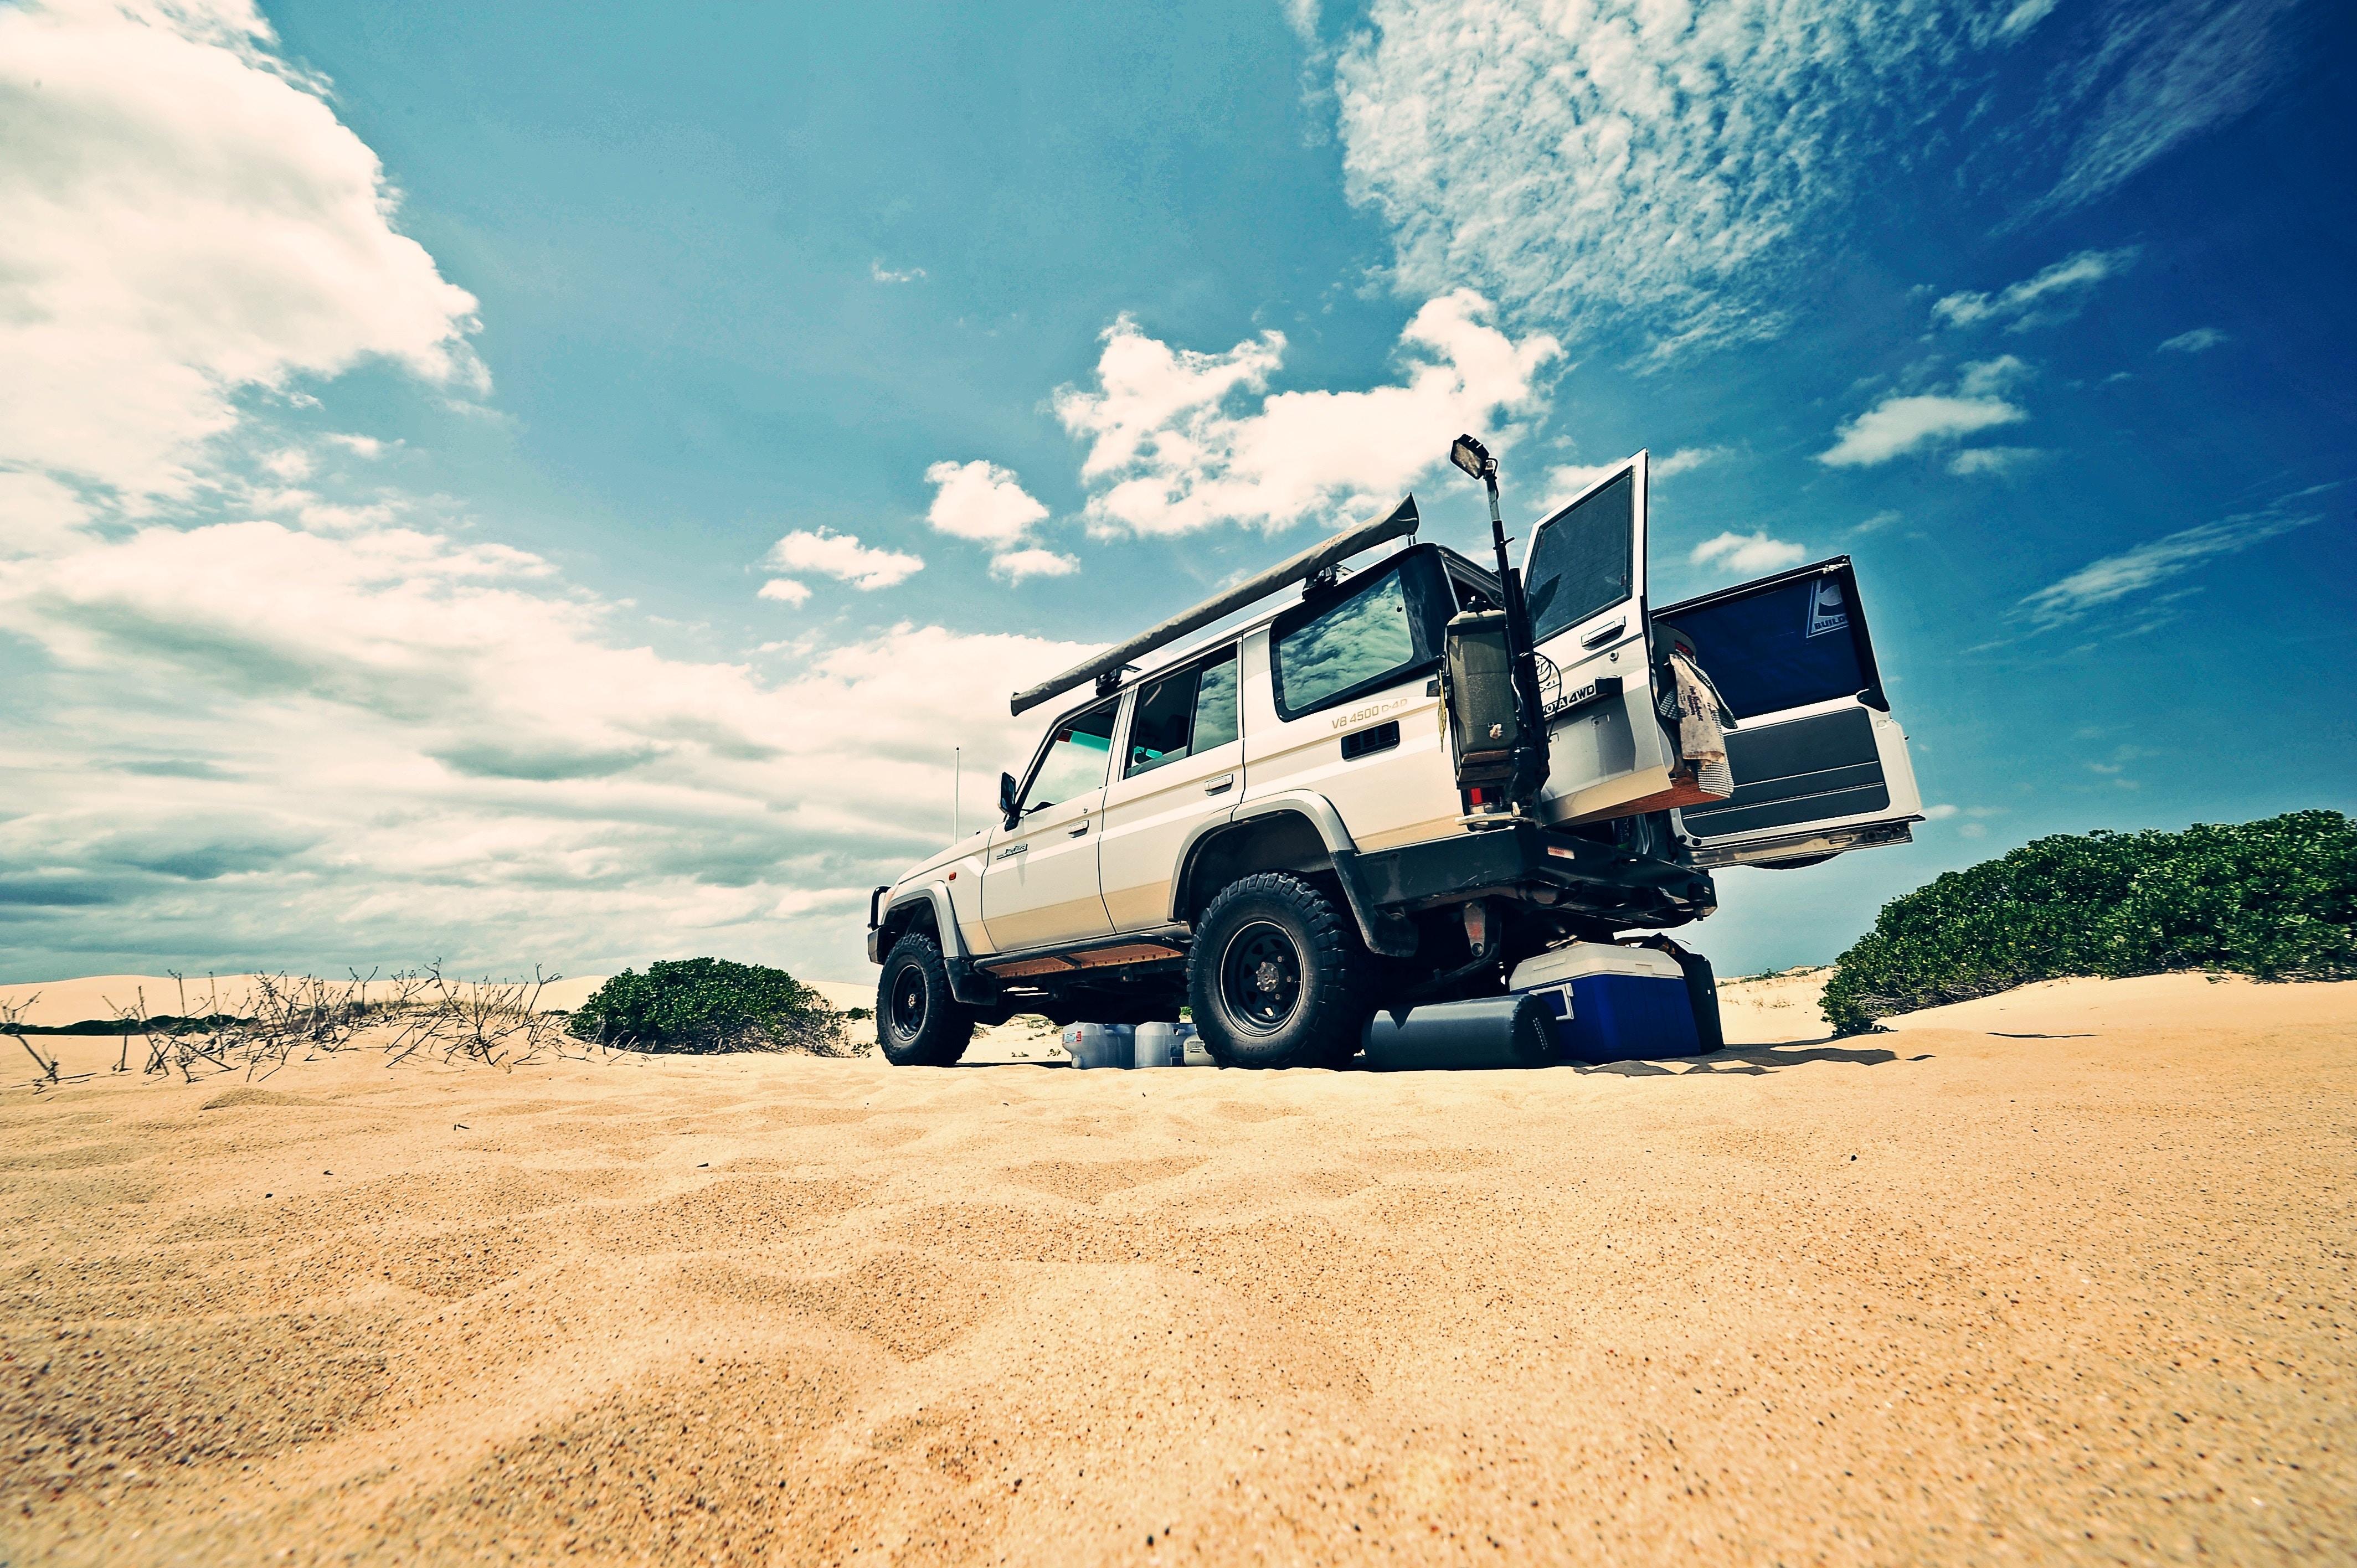 car at desert